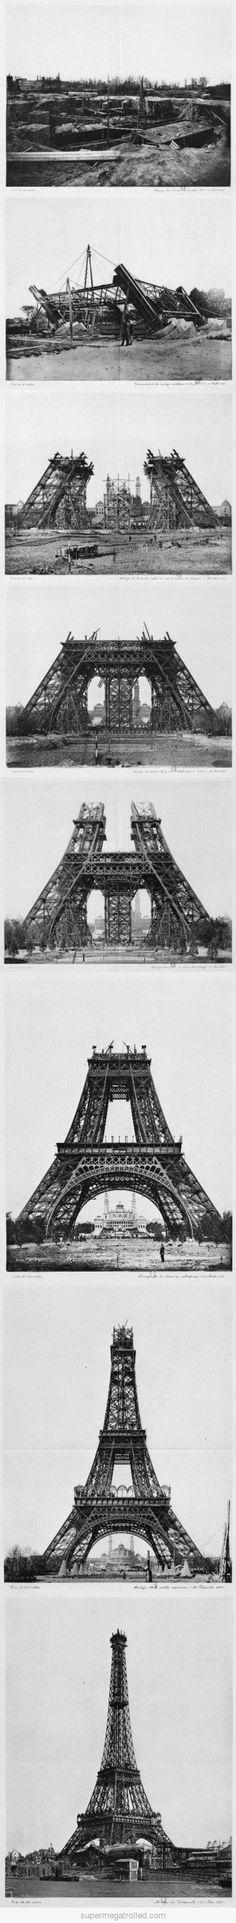 Building of the Eiffel tower, Paris